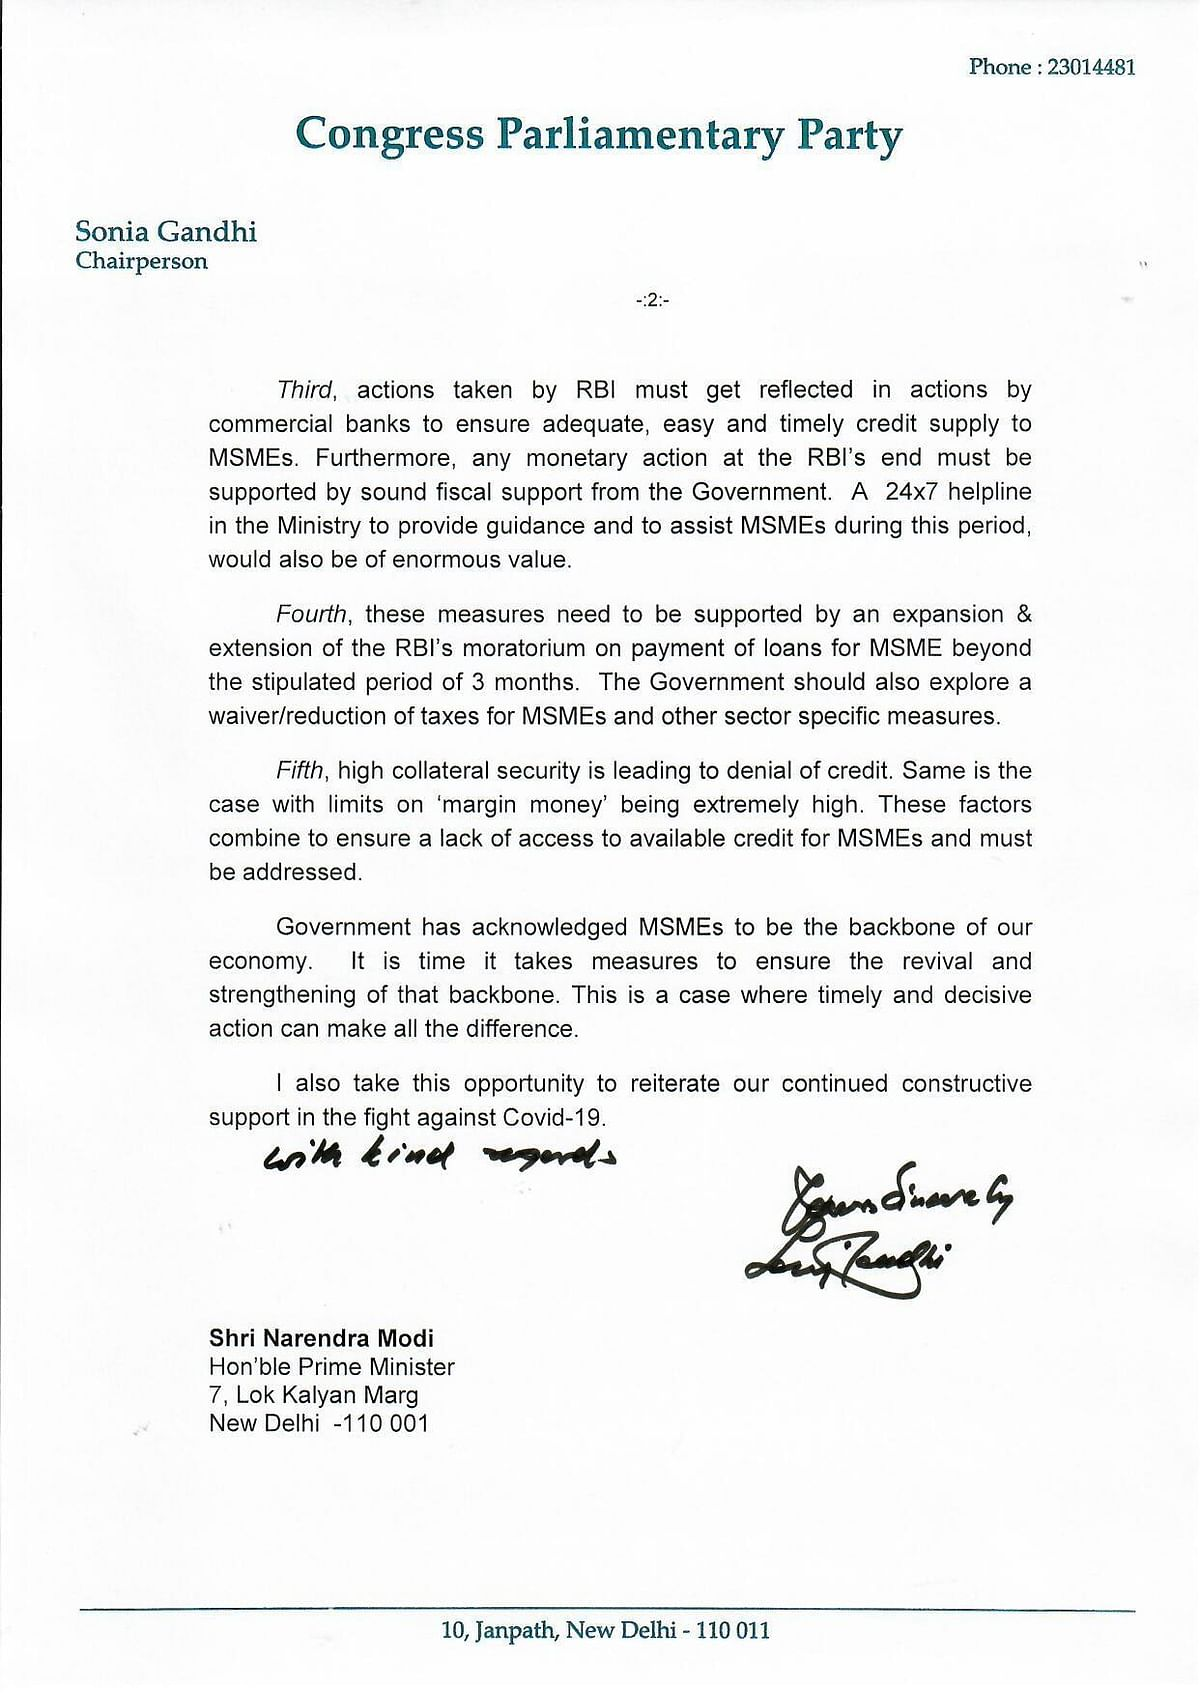 Congress President Sonia Gandhi writes to PM Modi; seeks economic package for revival of MSMEs